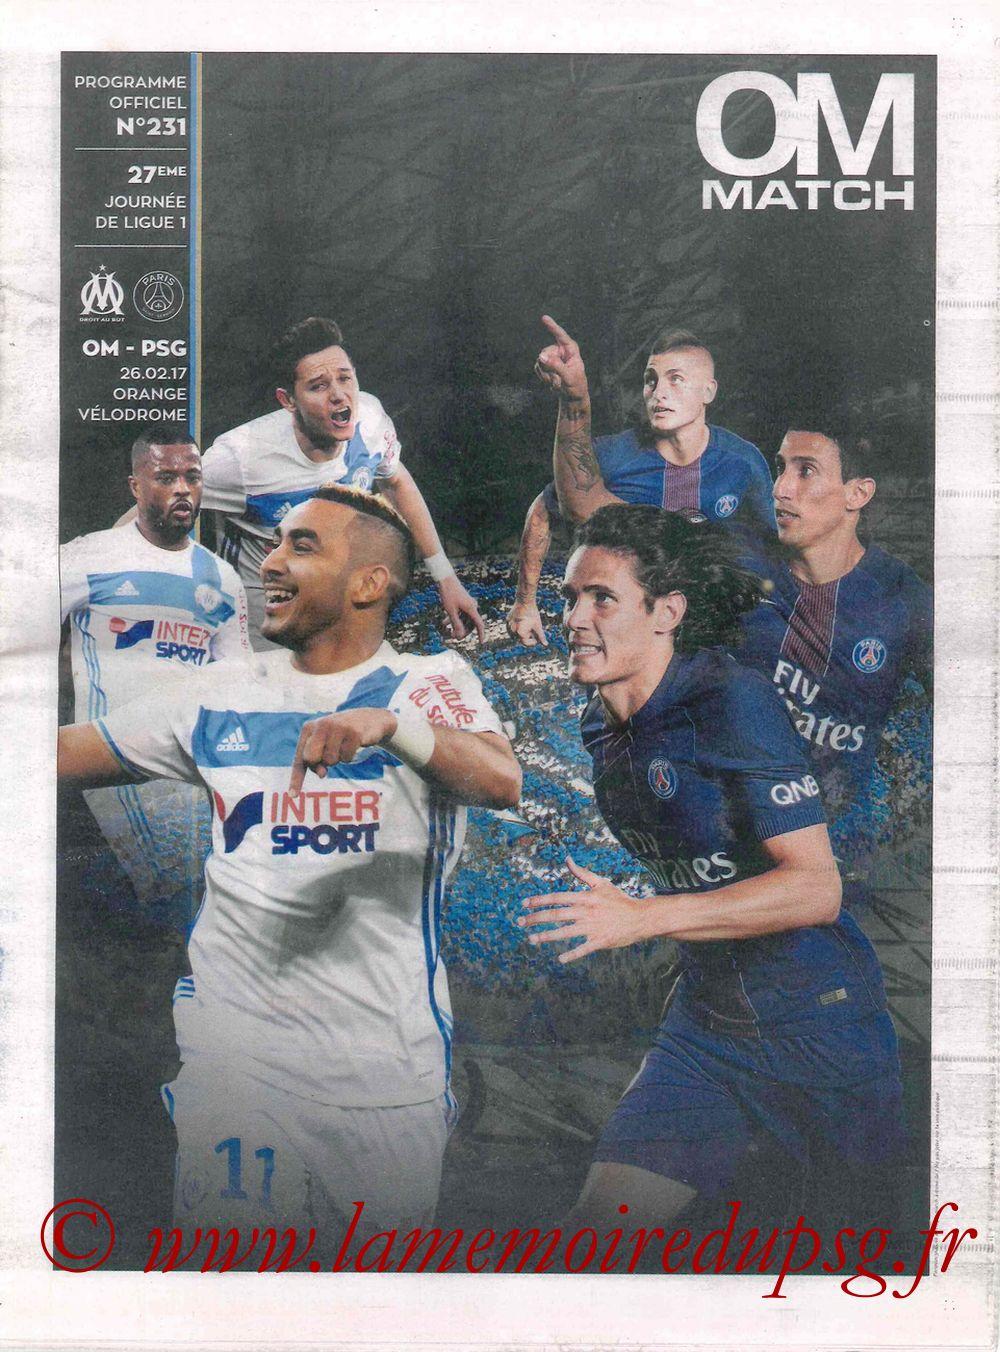 2017-02-26  Marseille-PSG (27ème L1, OM Match N° 231)